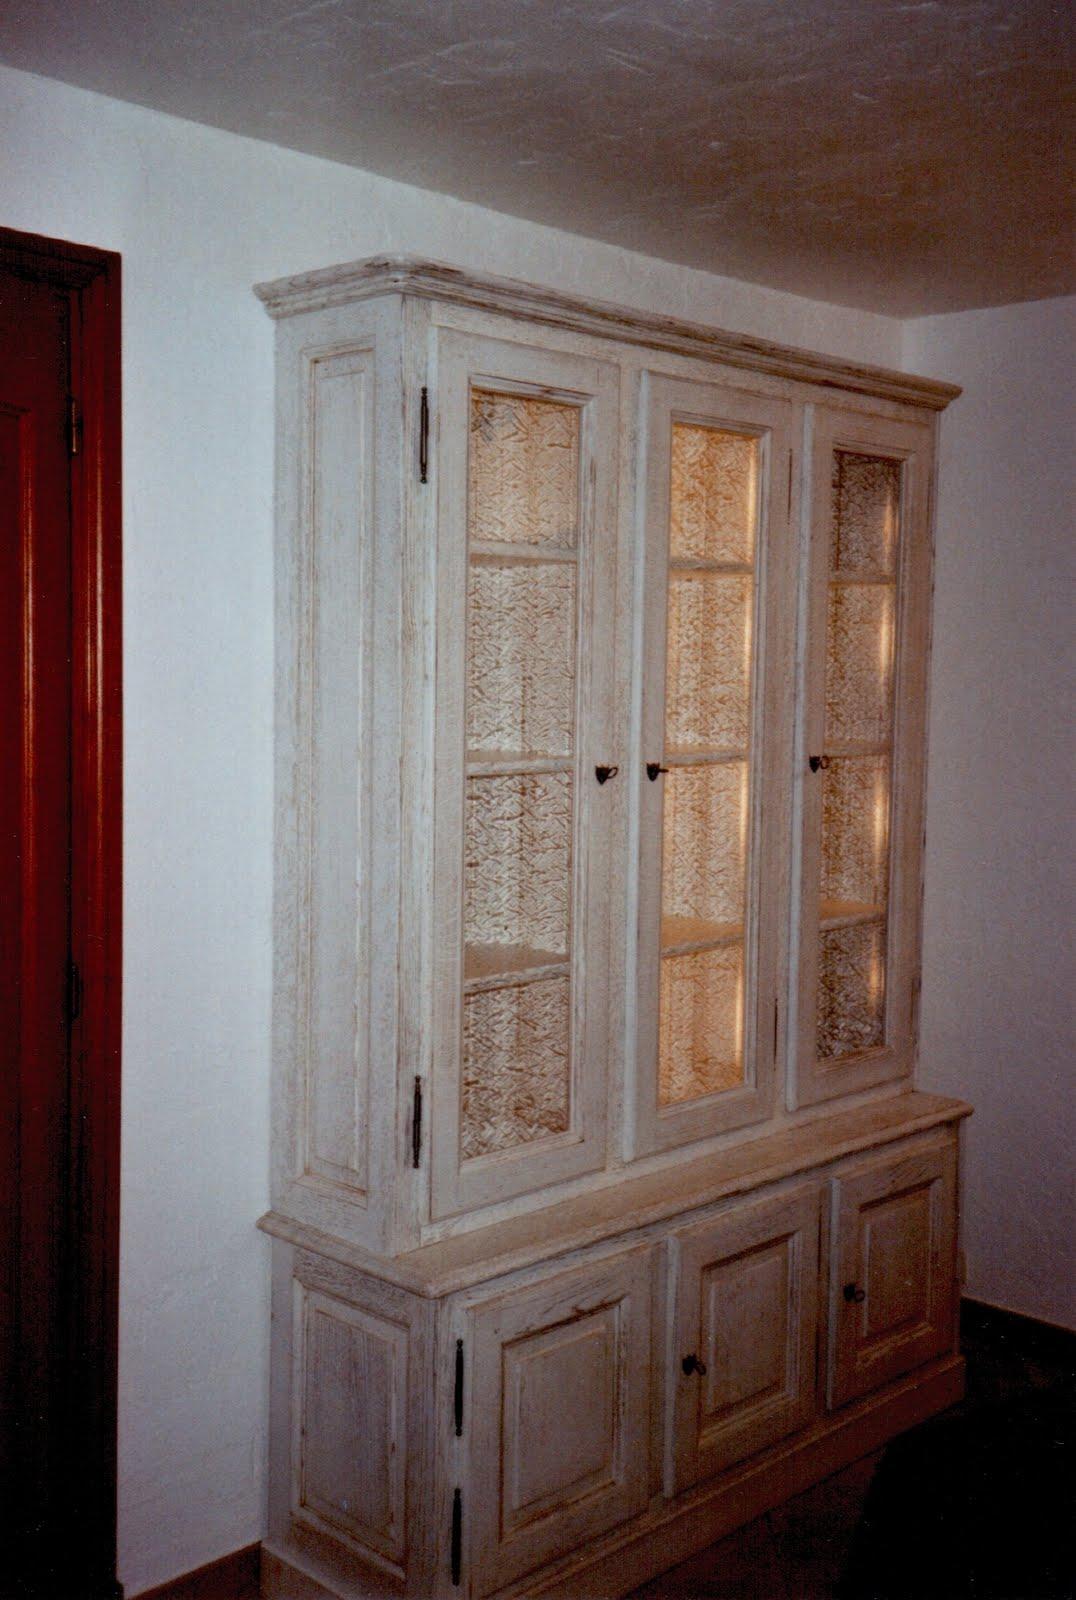 menuiserie vanin biblioth que en peinture cerus e blanche. Black Bedroom Furniture Sets. Home Design Ideas